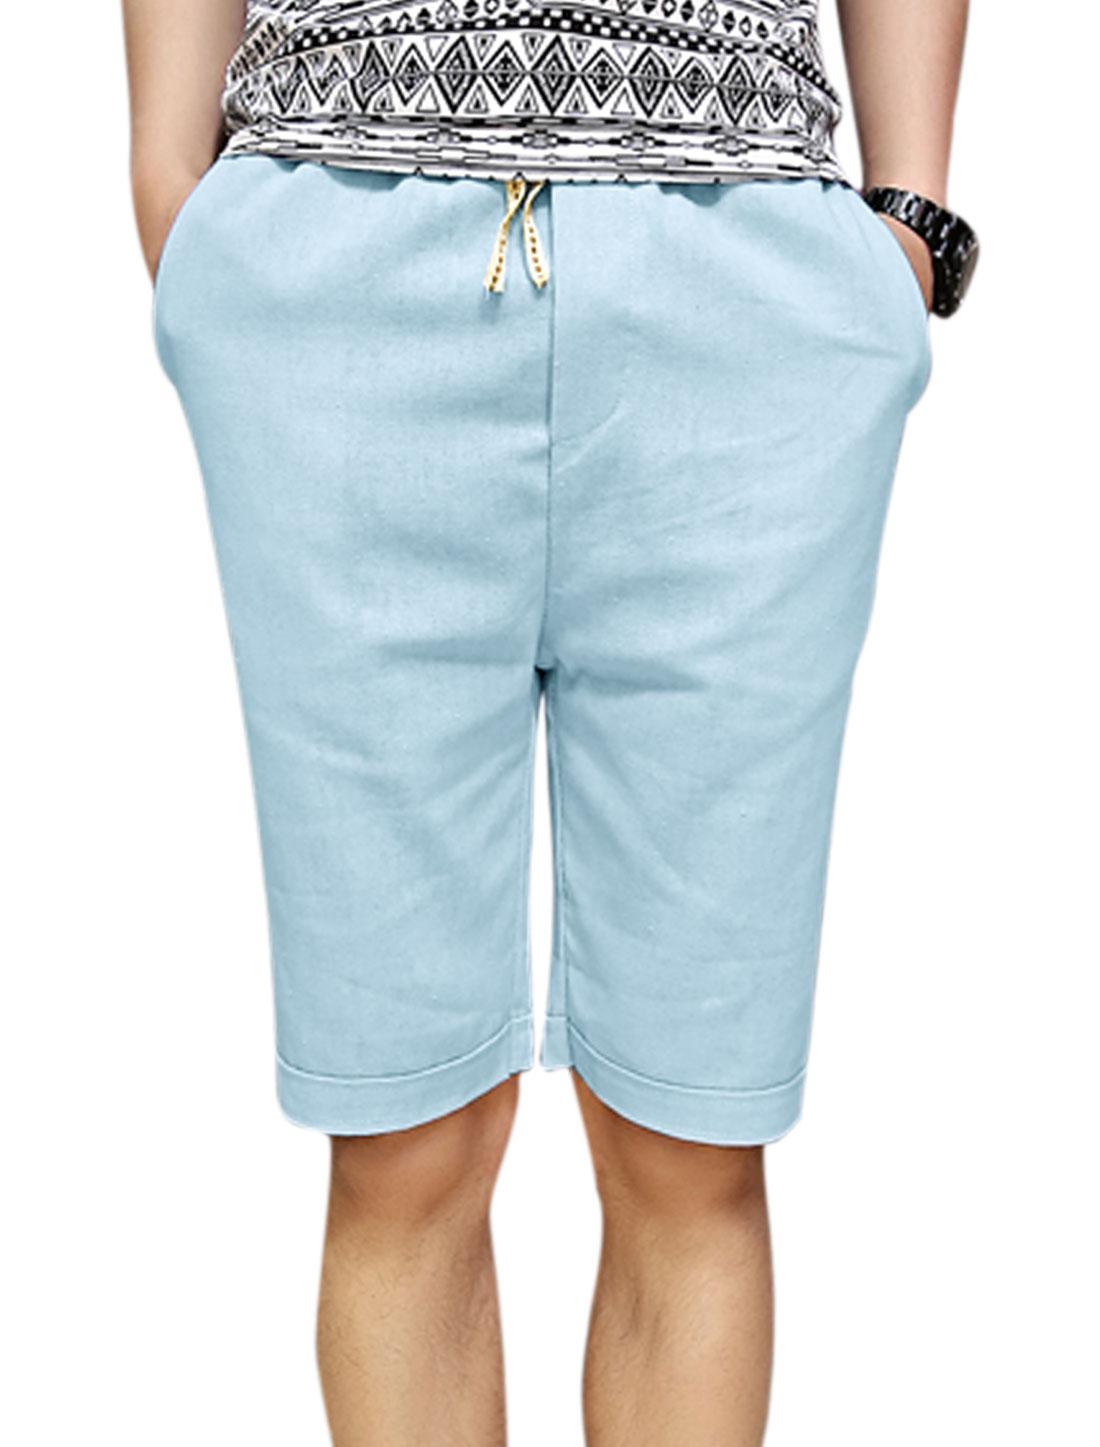 Man's Drawstring Waist Slant Front Pockets Mid Rise Shorts Light Blue W30